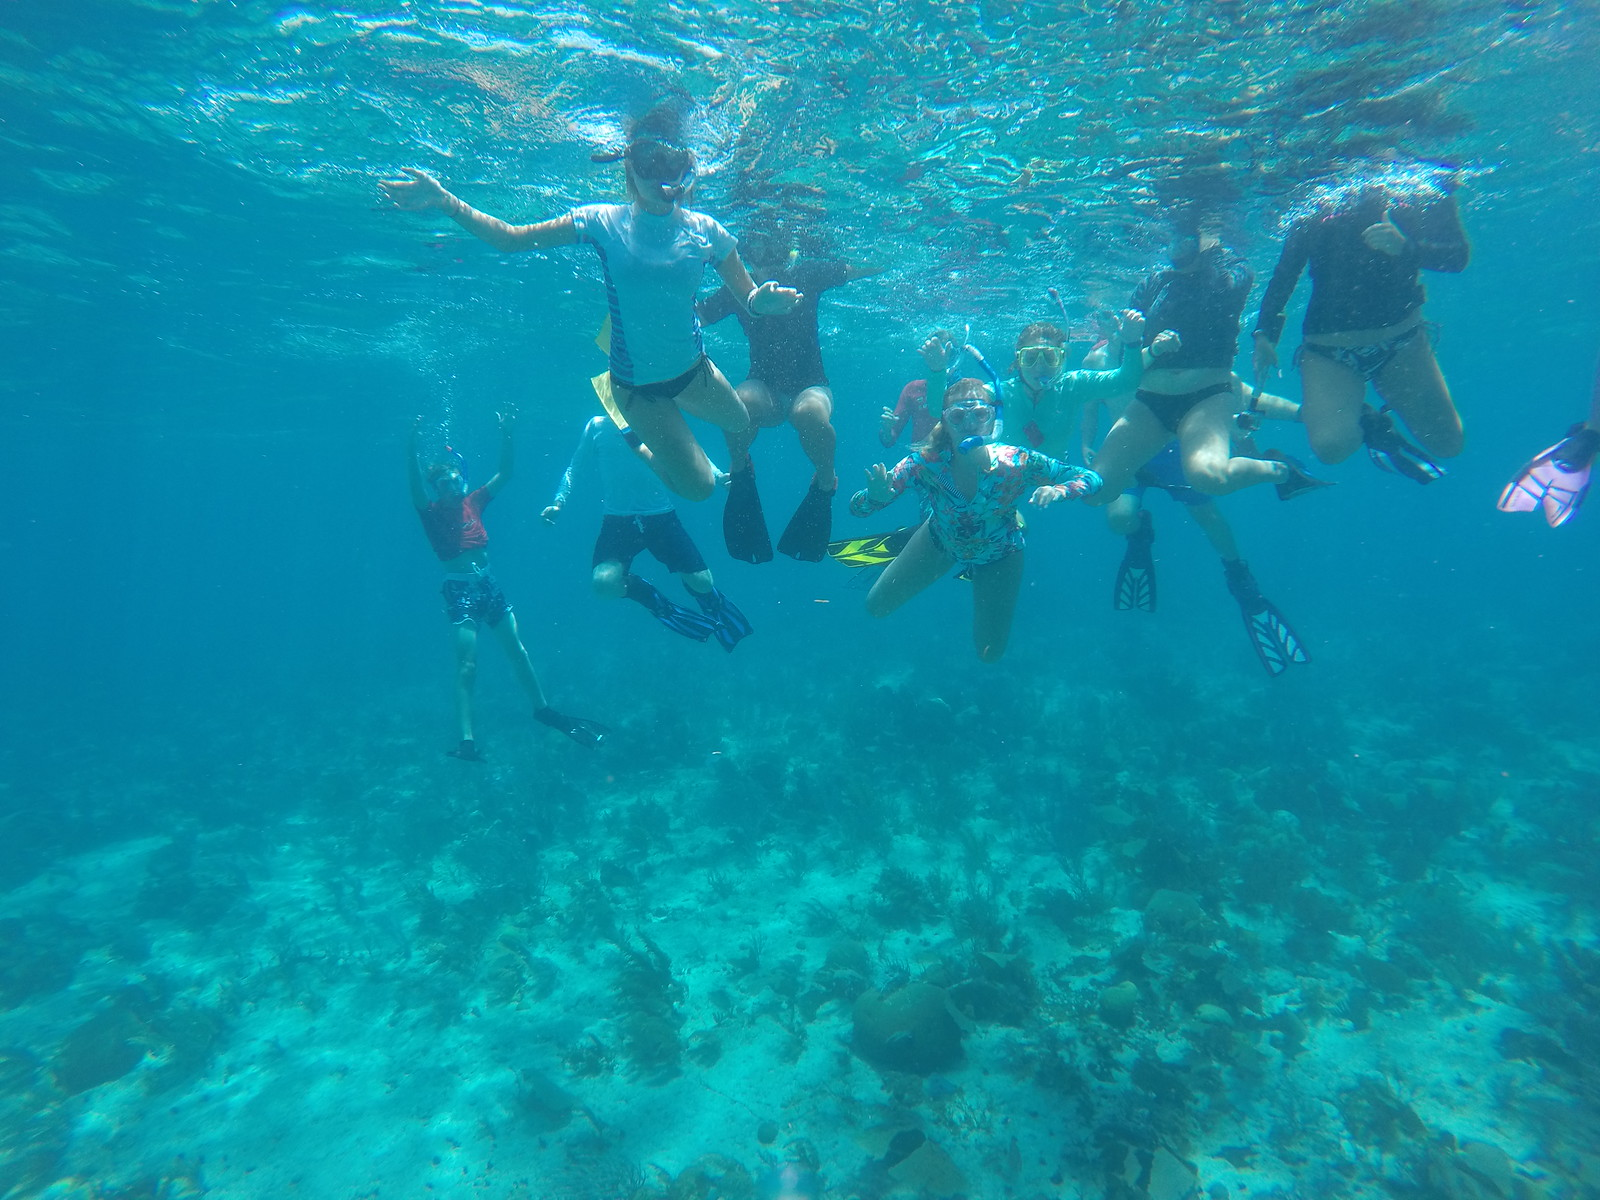 Snorkeling on the Belize Barrier Reef.